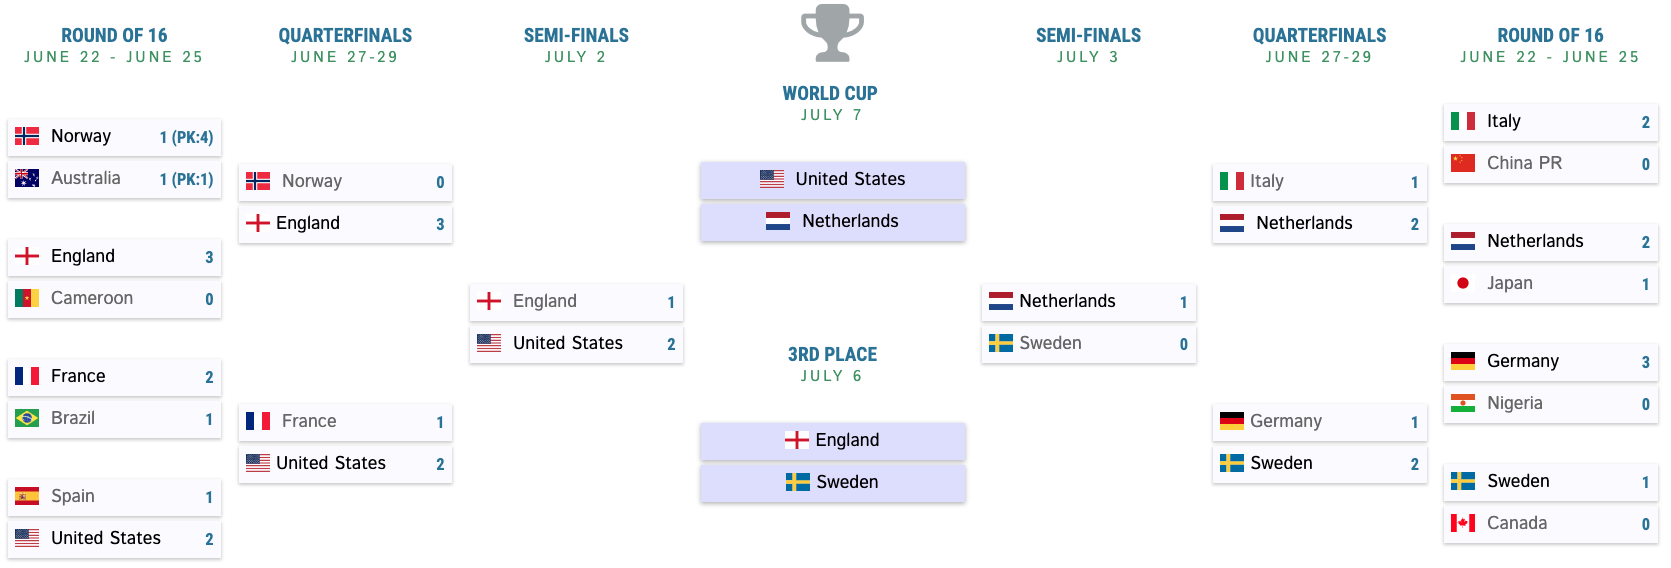 wwc-2019-final-bracket.png